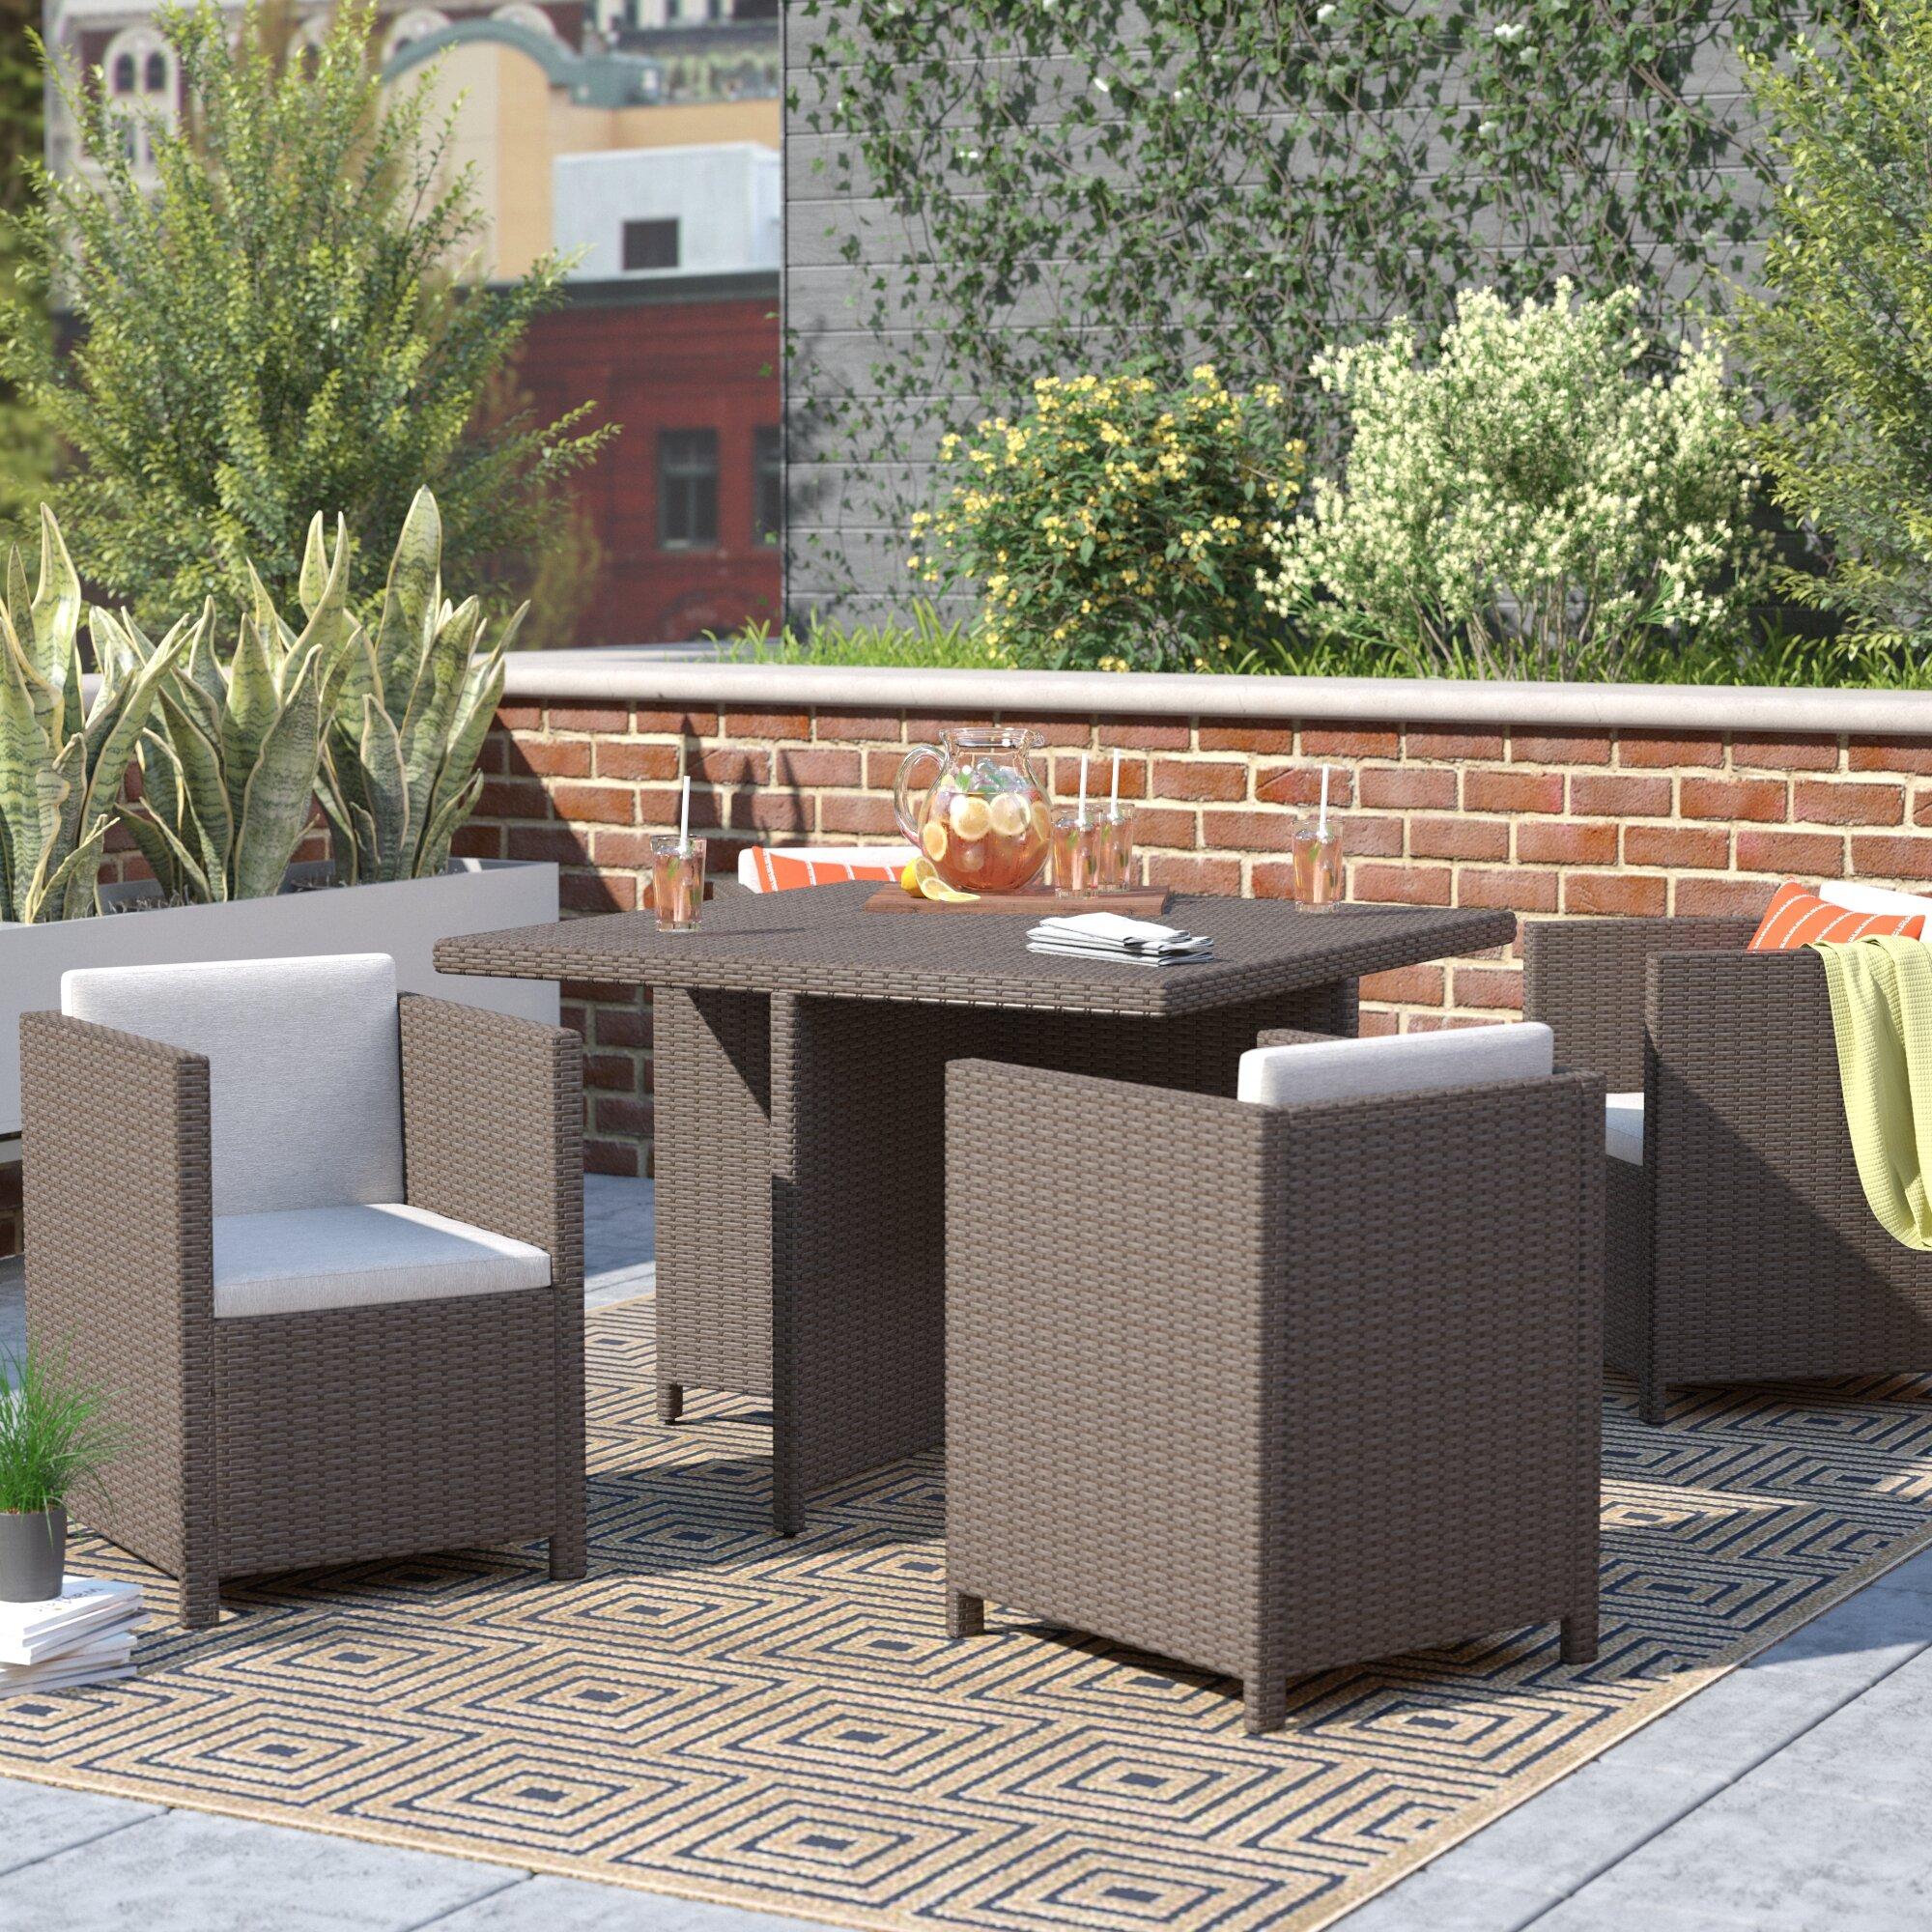 Charmant Willa Arlo Interiors Bashir Outdoor Wicker Dining Set With Cushions U0026  Reviews | Wayfair